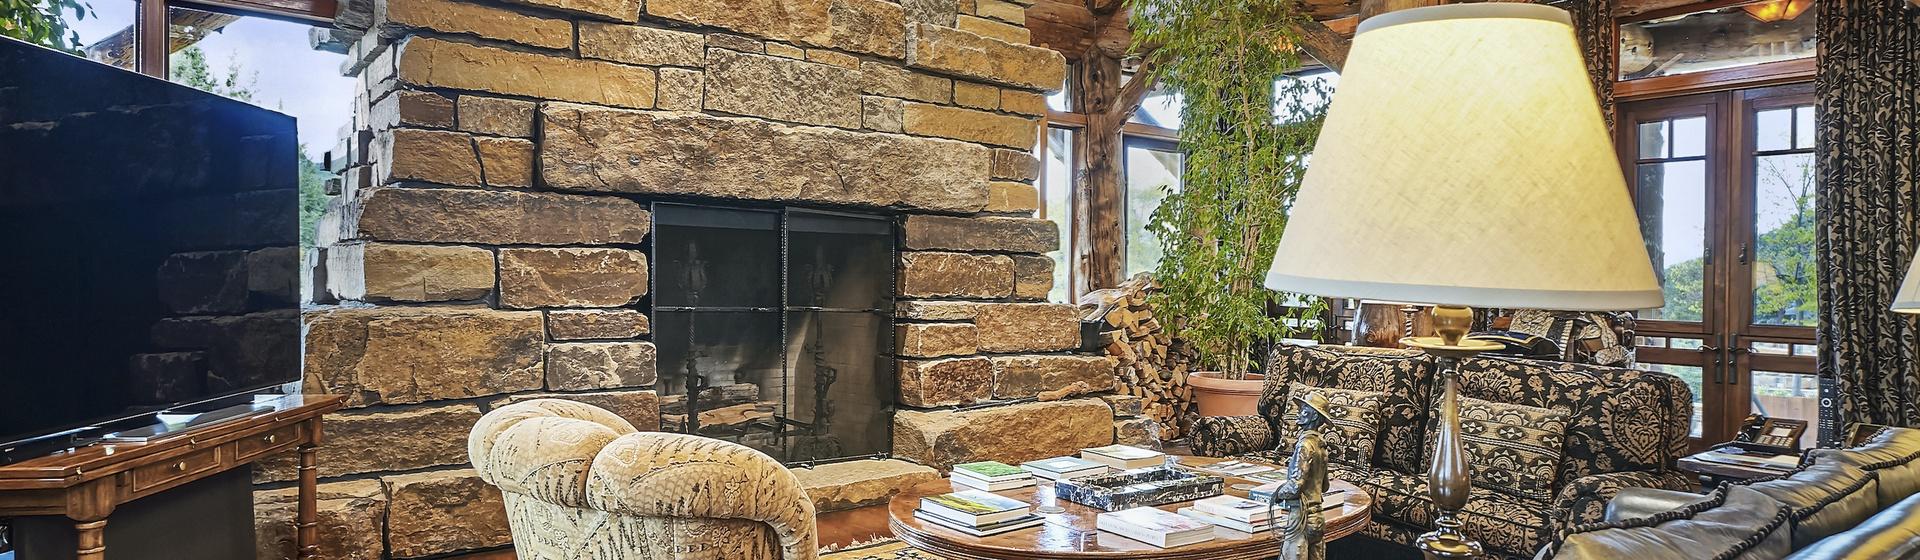 1.2-Telluride-Sleeping-Indian-Ranch-lliving-room-fireplace-1-web.JPG